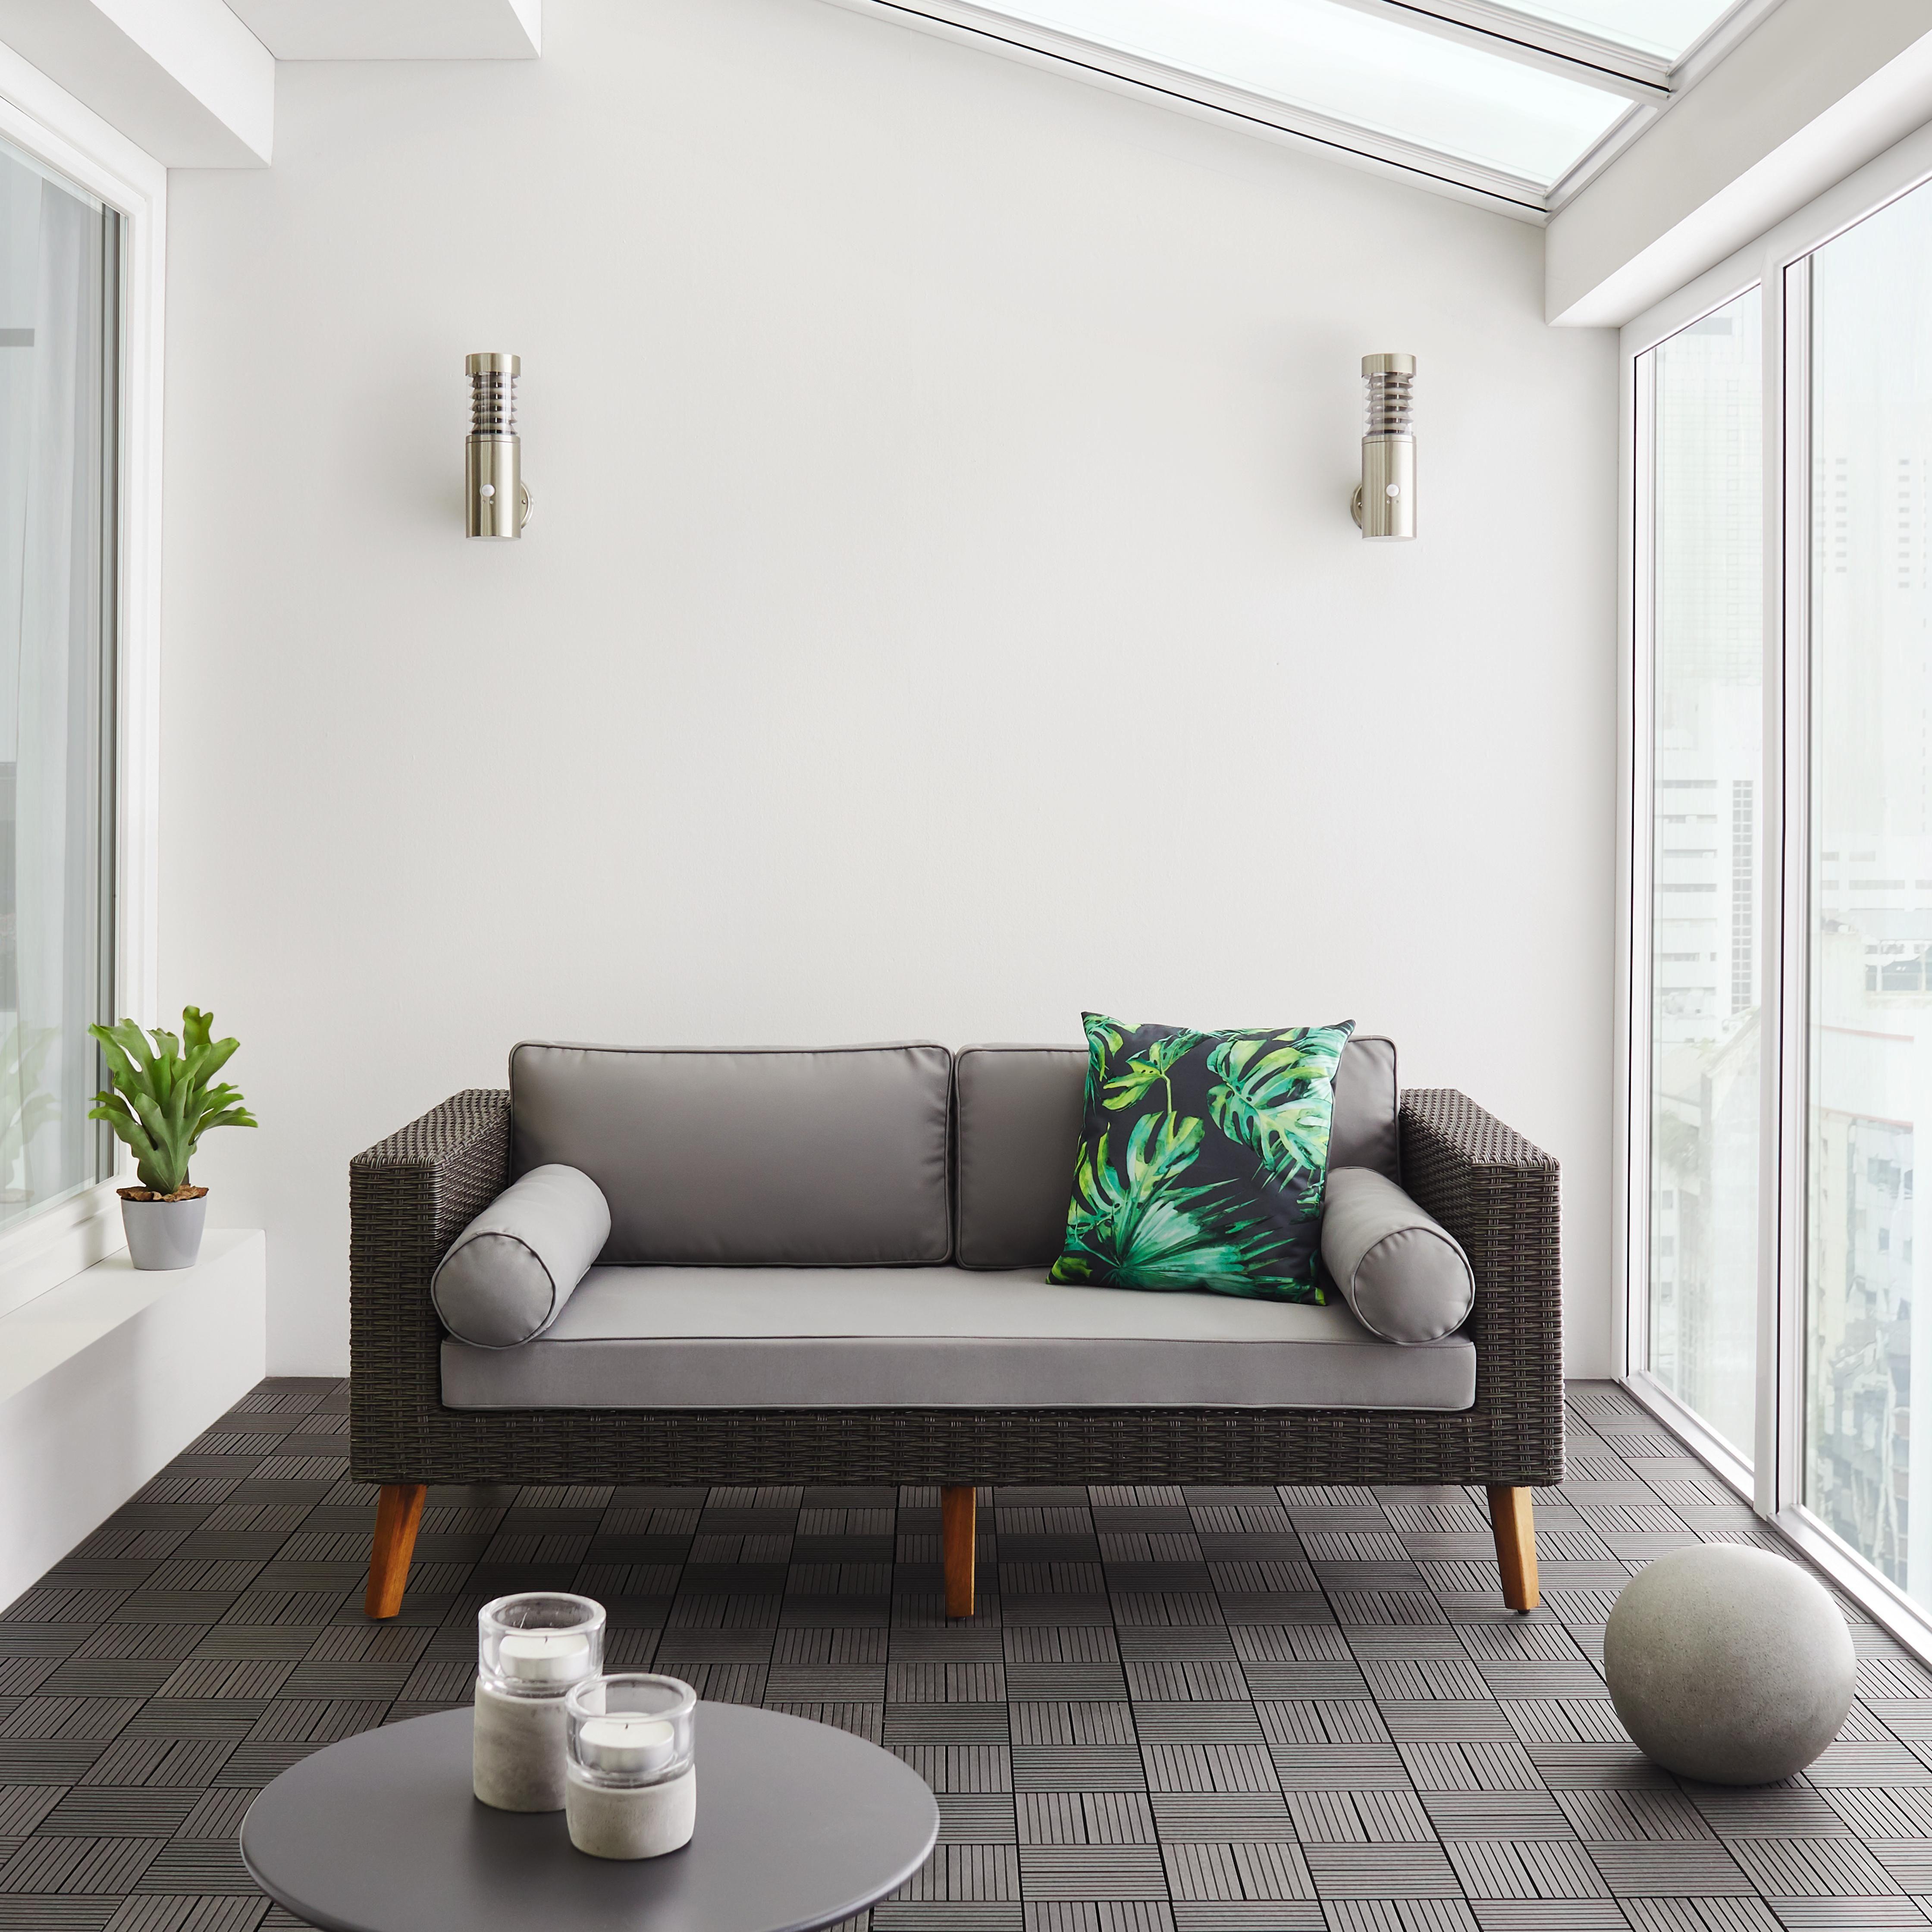 Loungesofa Vittorio 6-teilig - Grau, MODERN, Holz/Kunststoff (162/65/82cm) - Modern Living